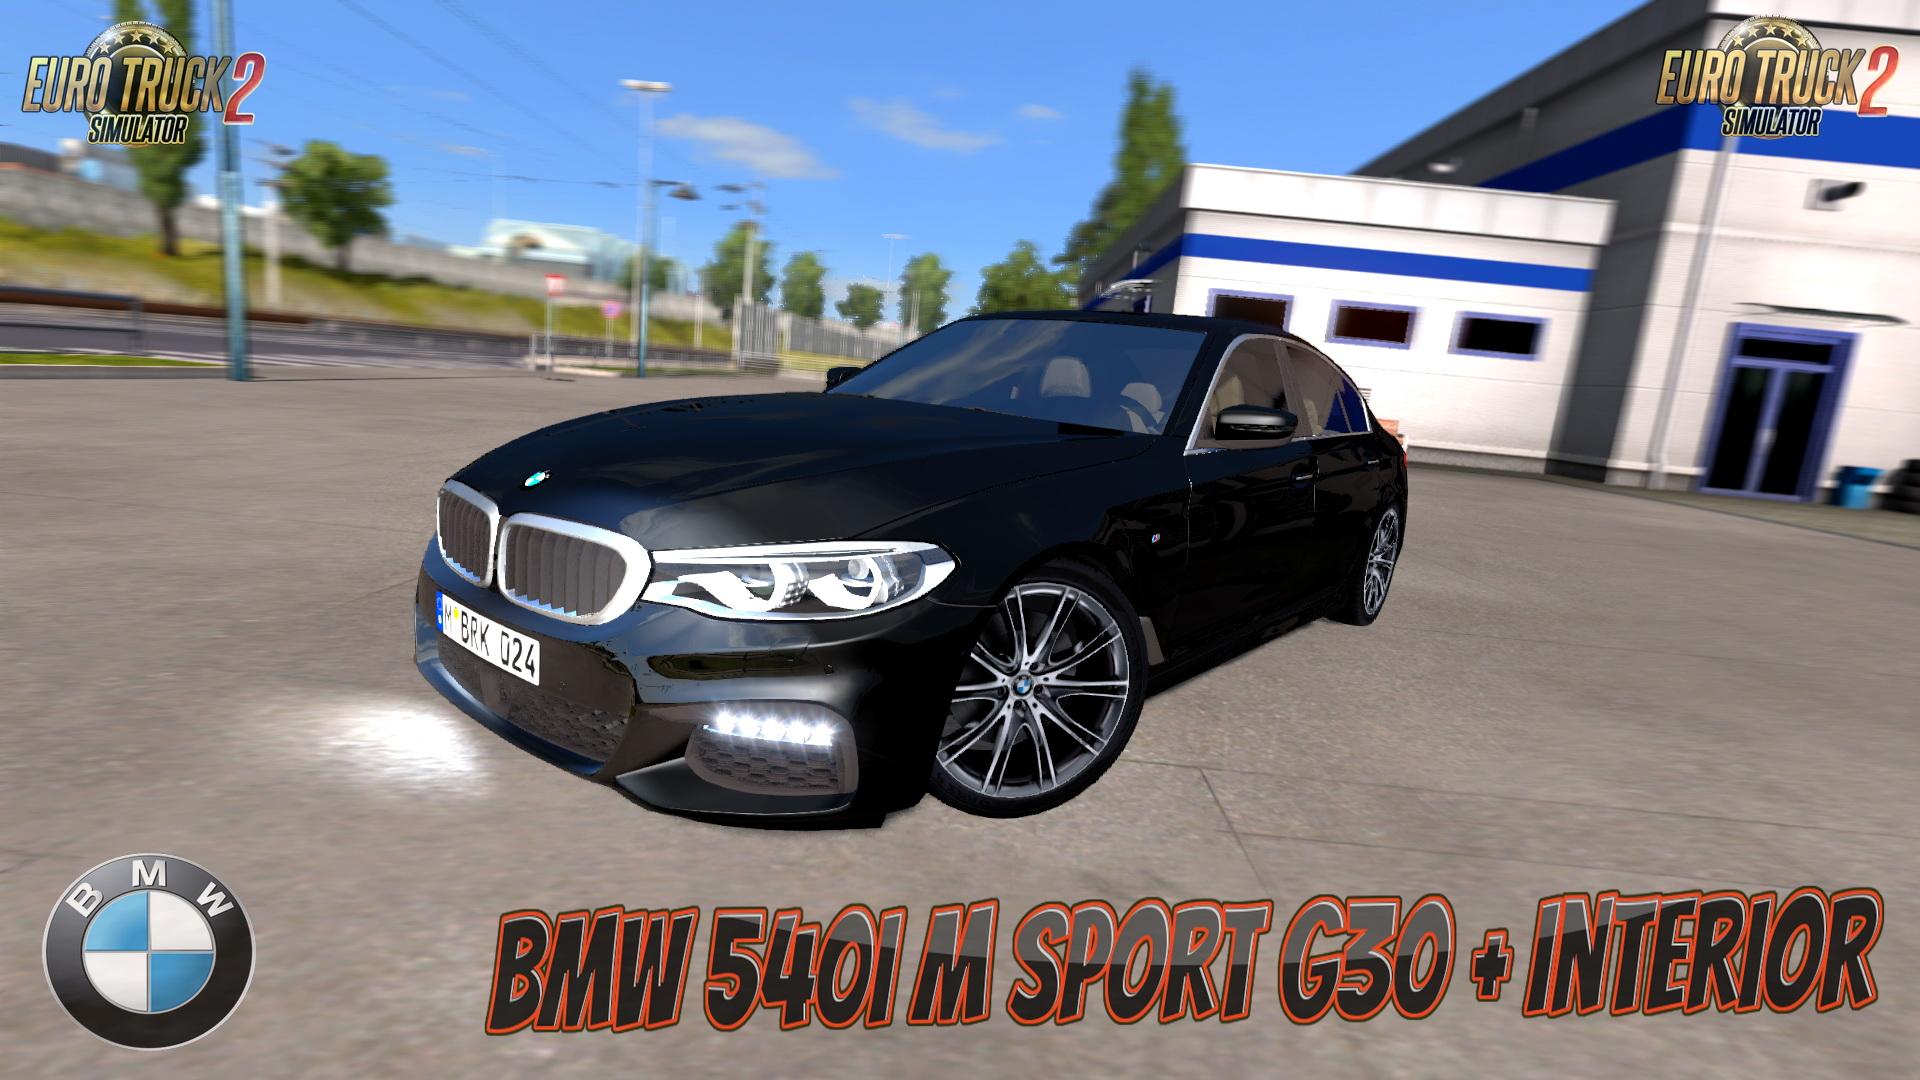 BMW 540i M Sport G30 + Interior by BurakTuna24 (1.28.x) - Euro Truck Simulator 2